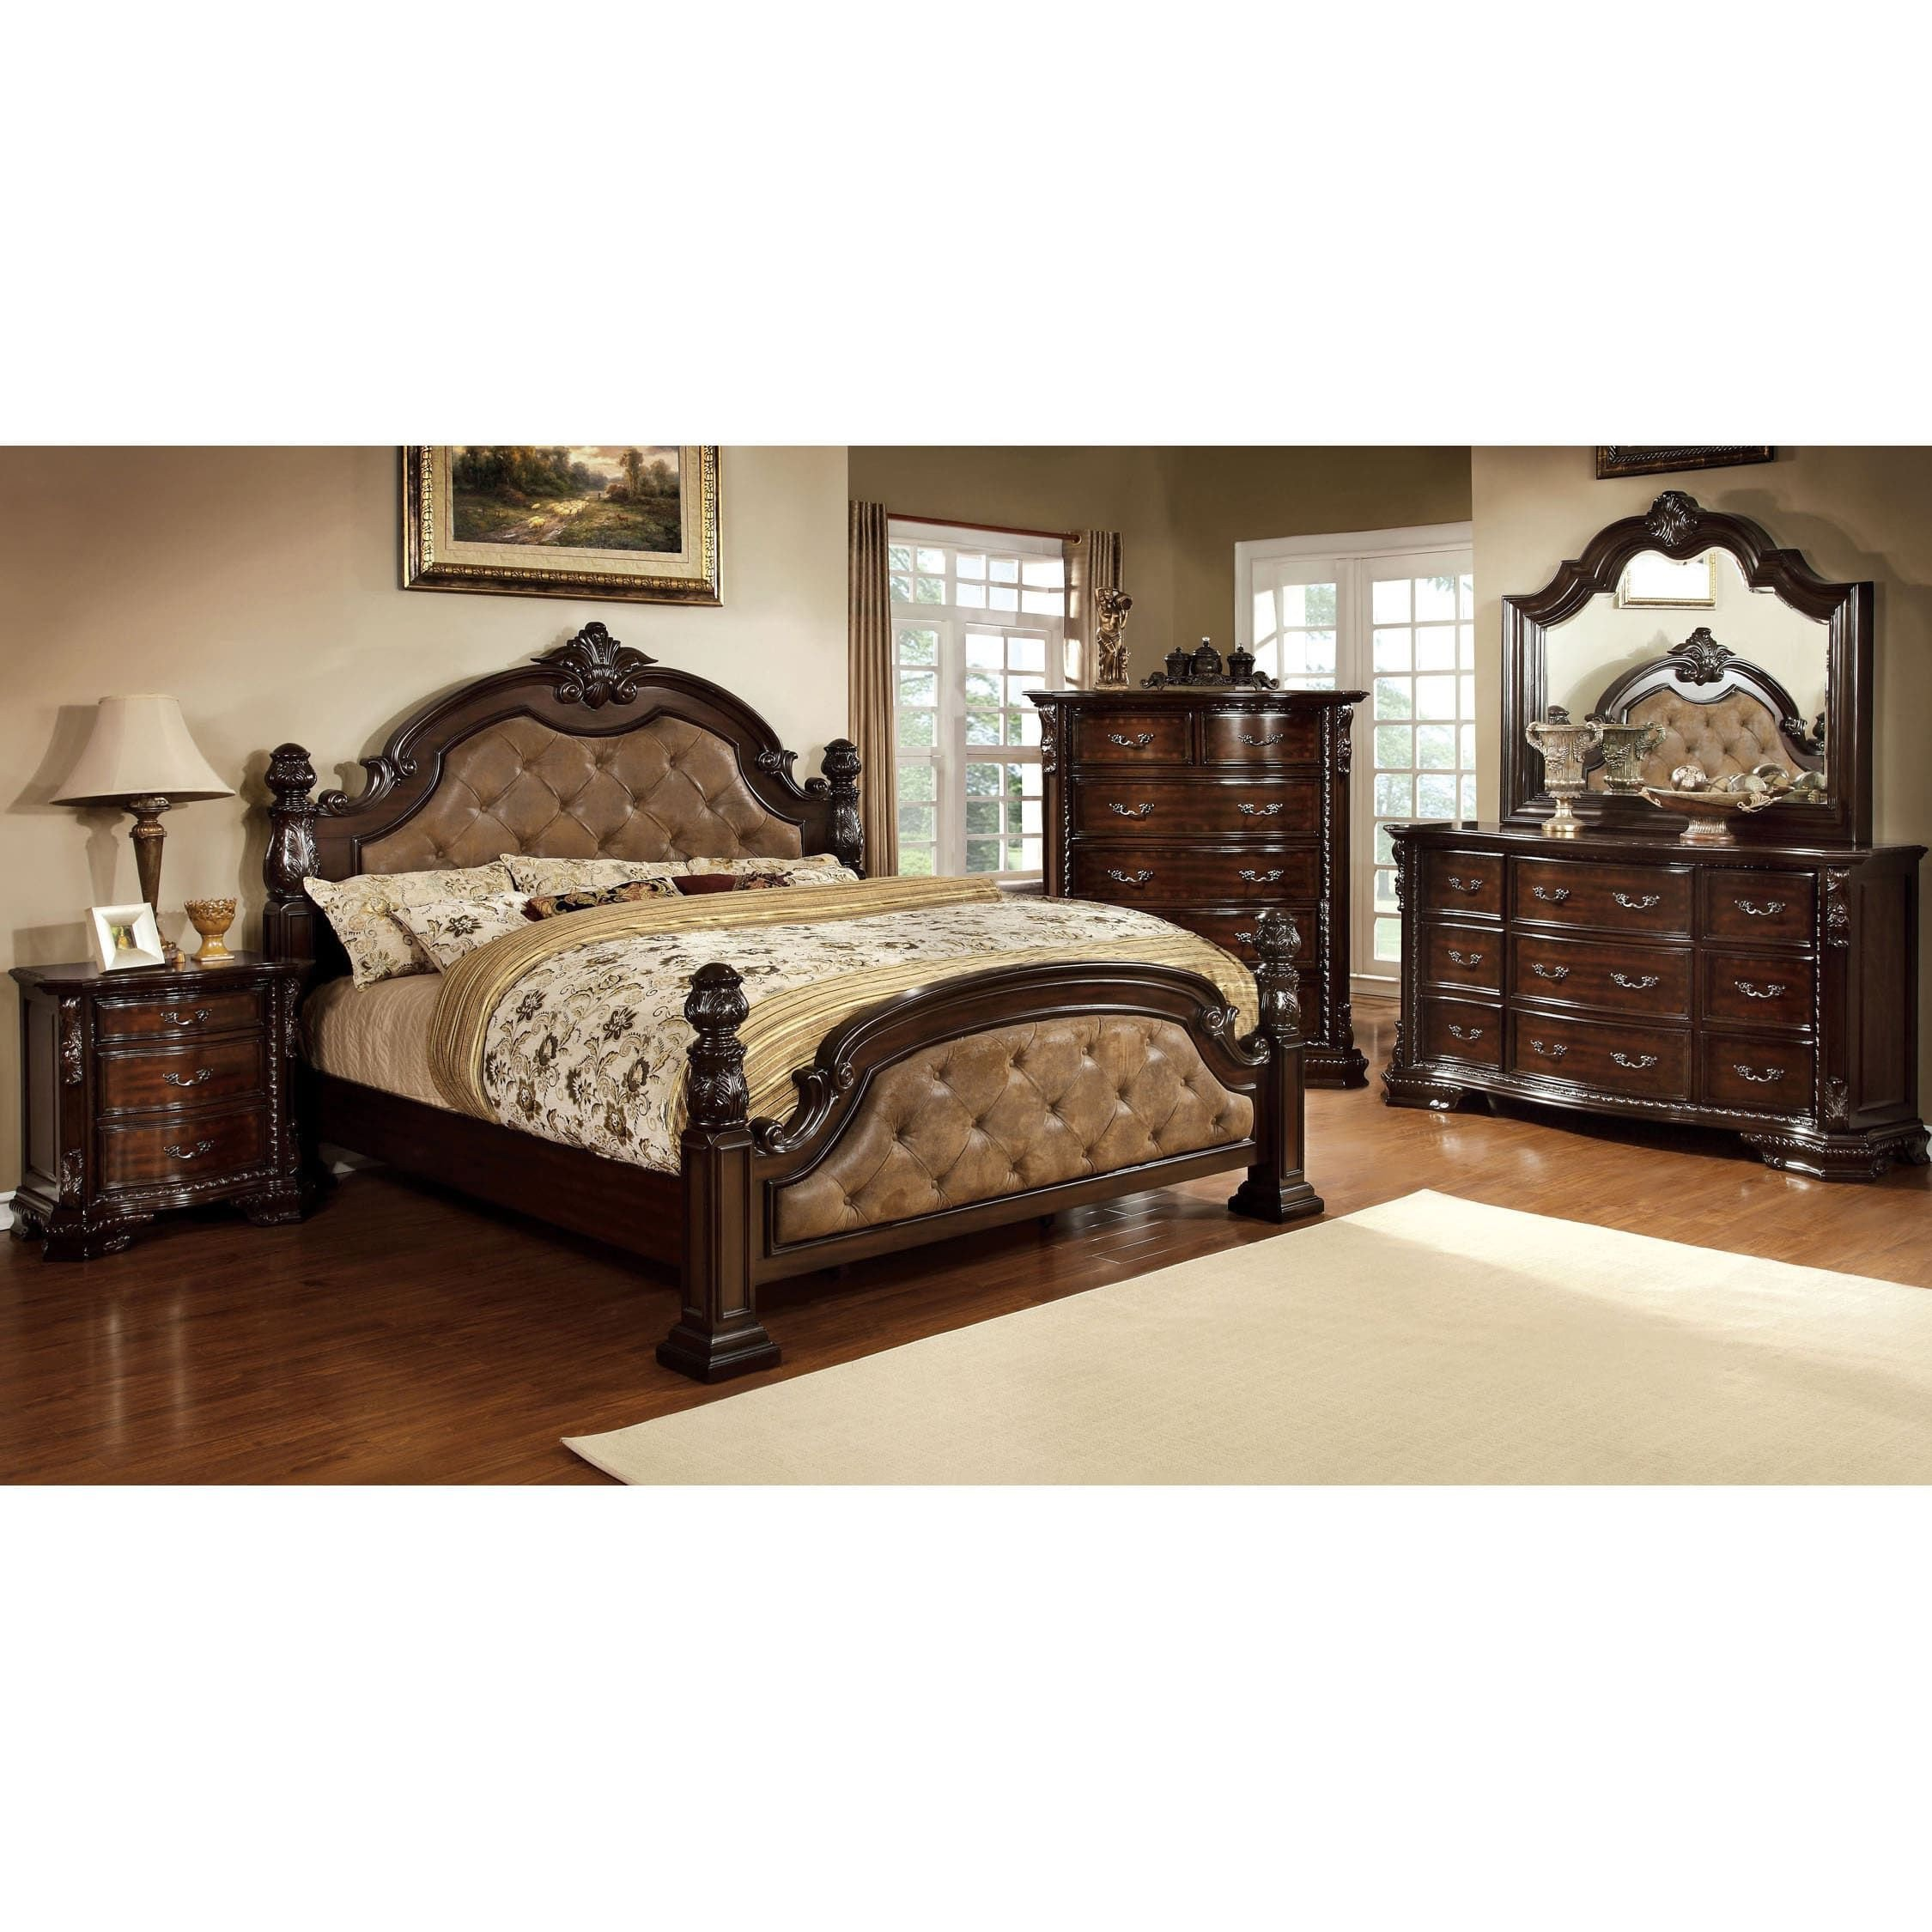 California King Bedroom Set Elegant Kassania Traditional 4 Piece Bedroom Set by Foa California